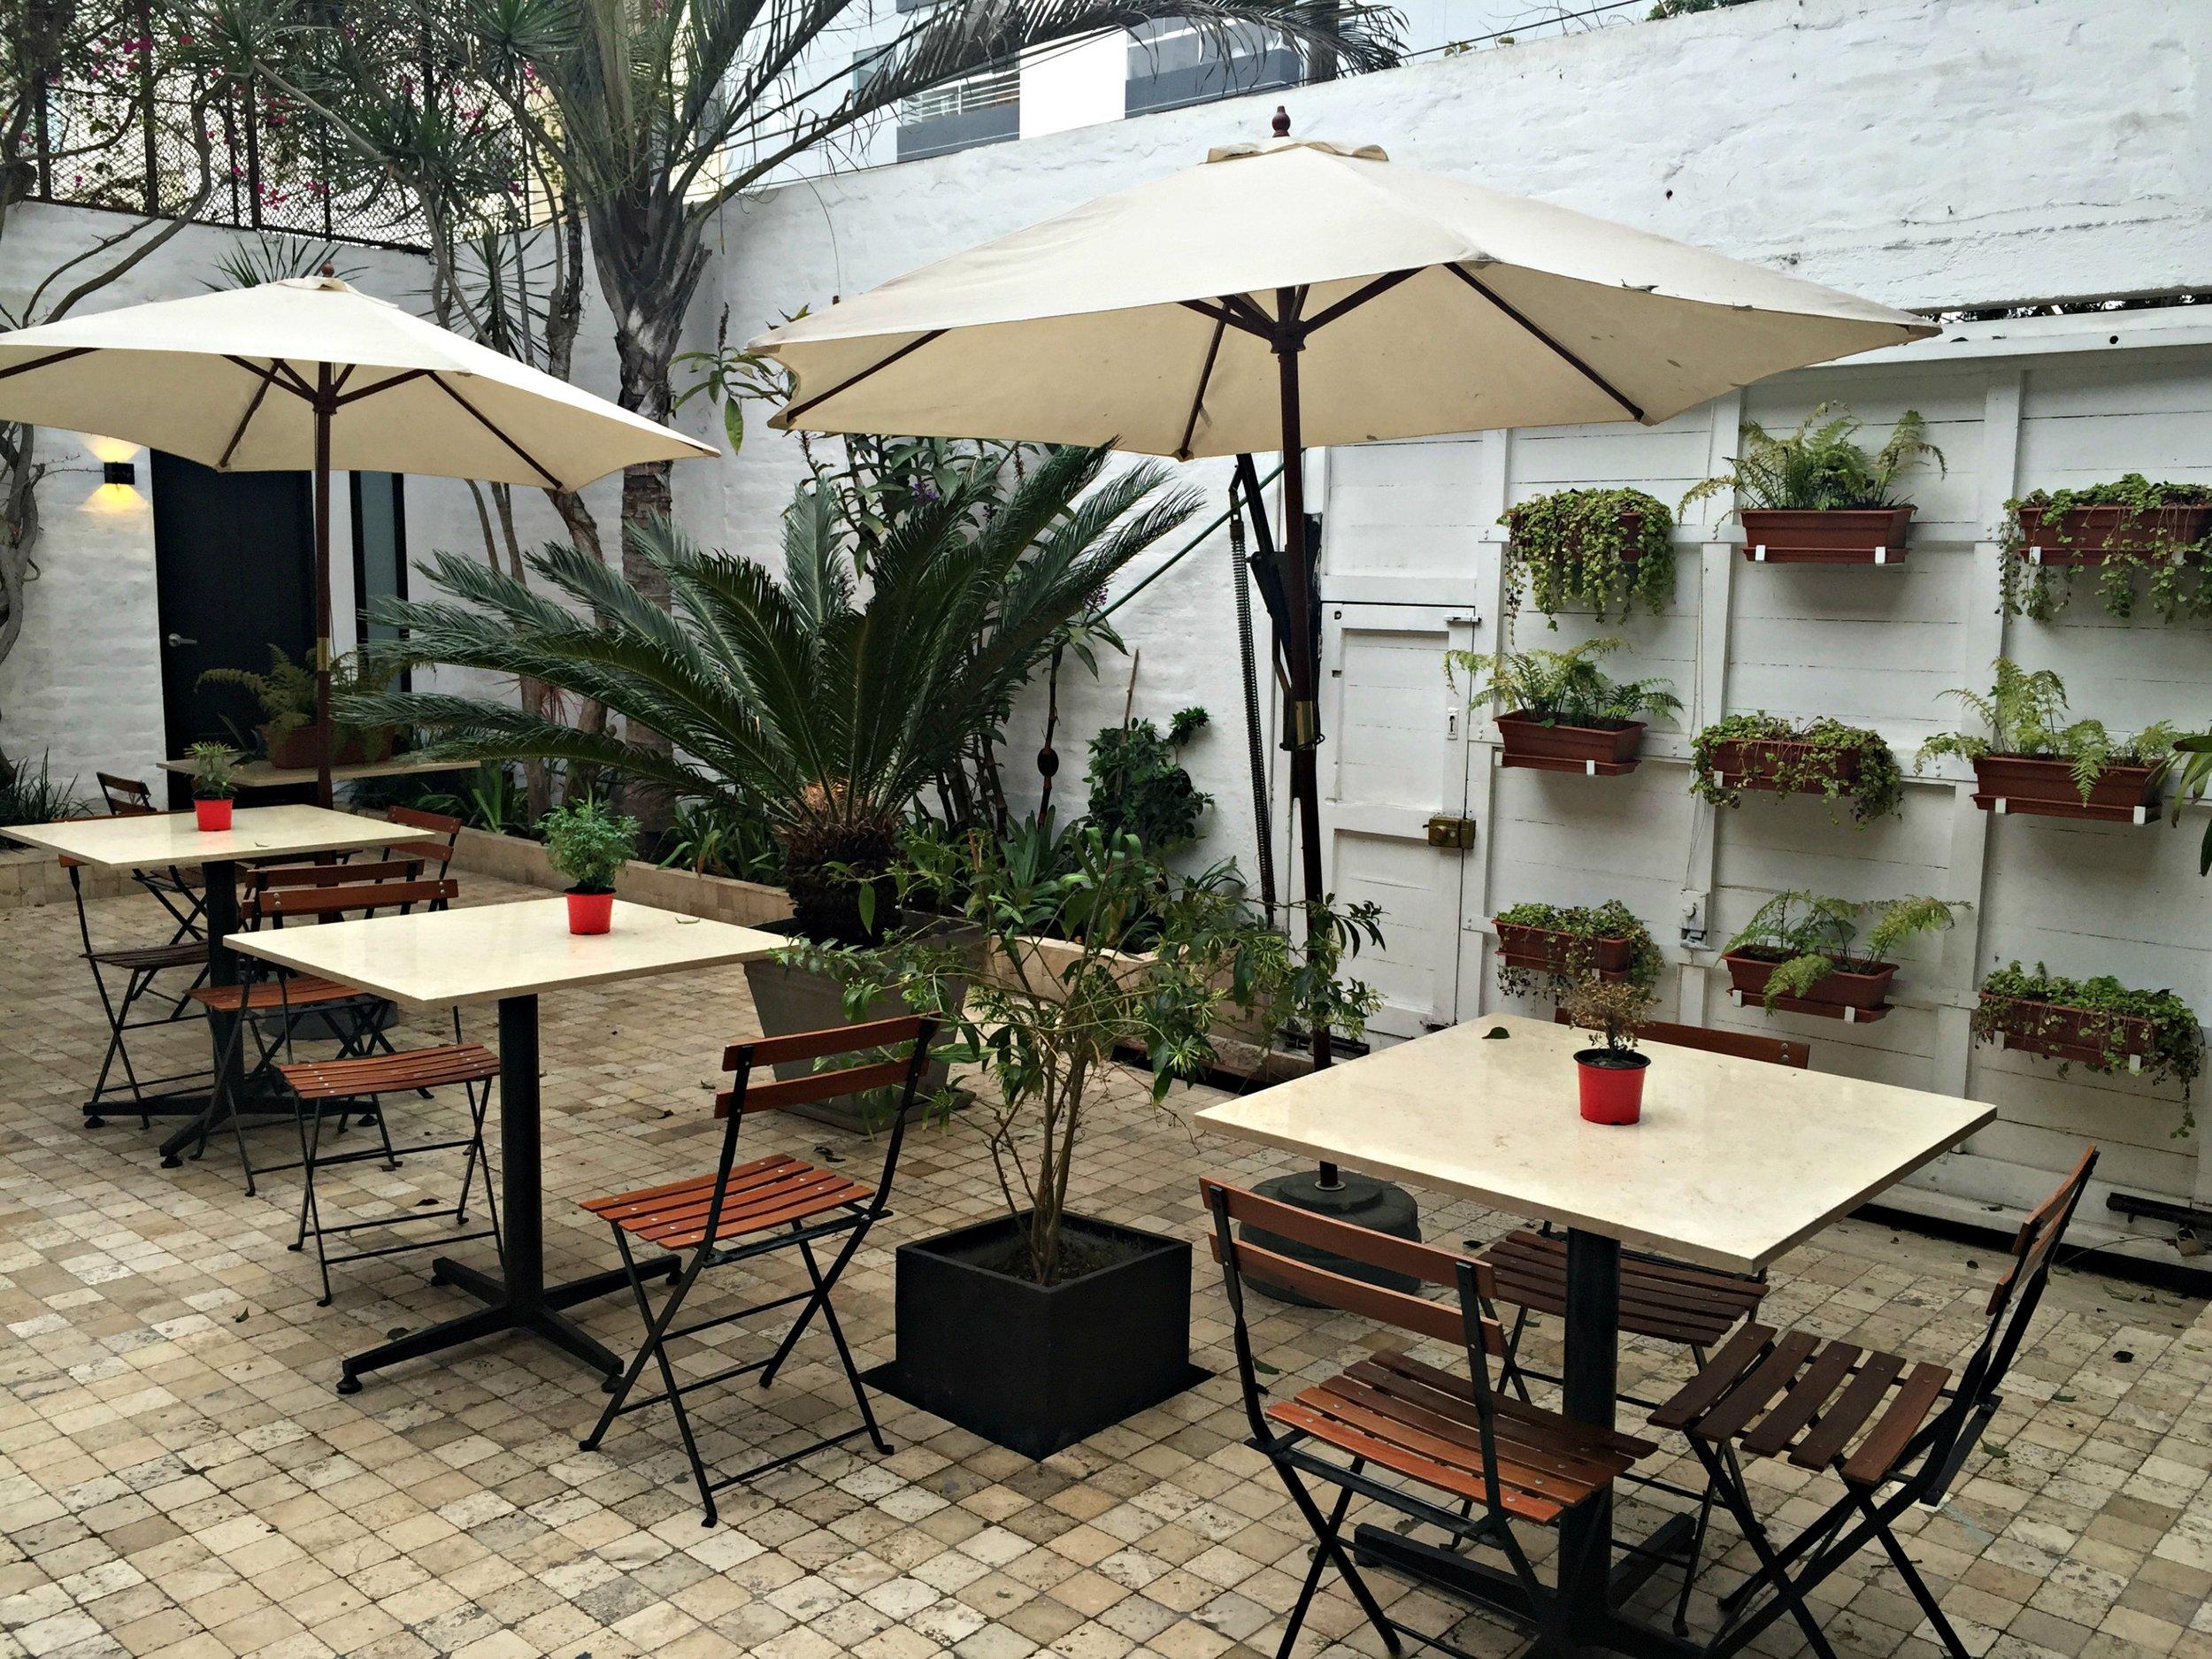 Travel Guide to Peru: Lot Boutique Hotel